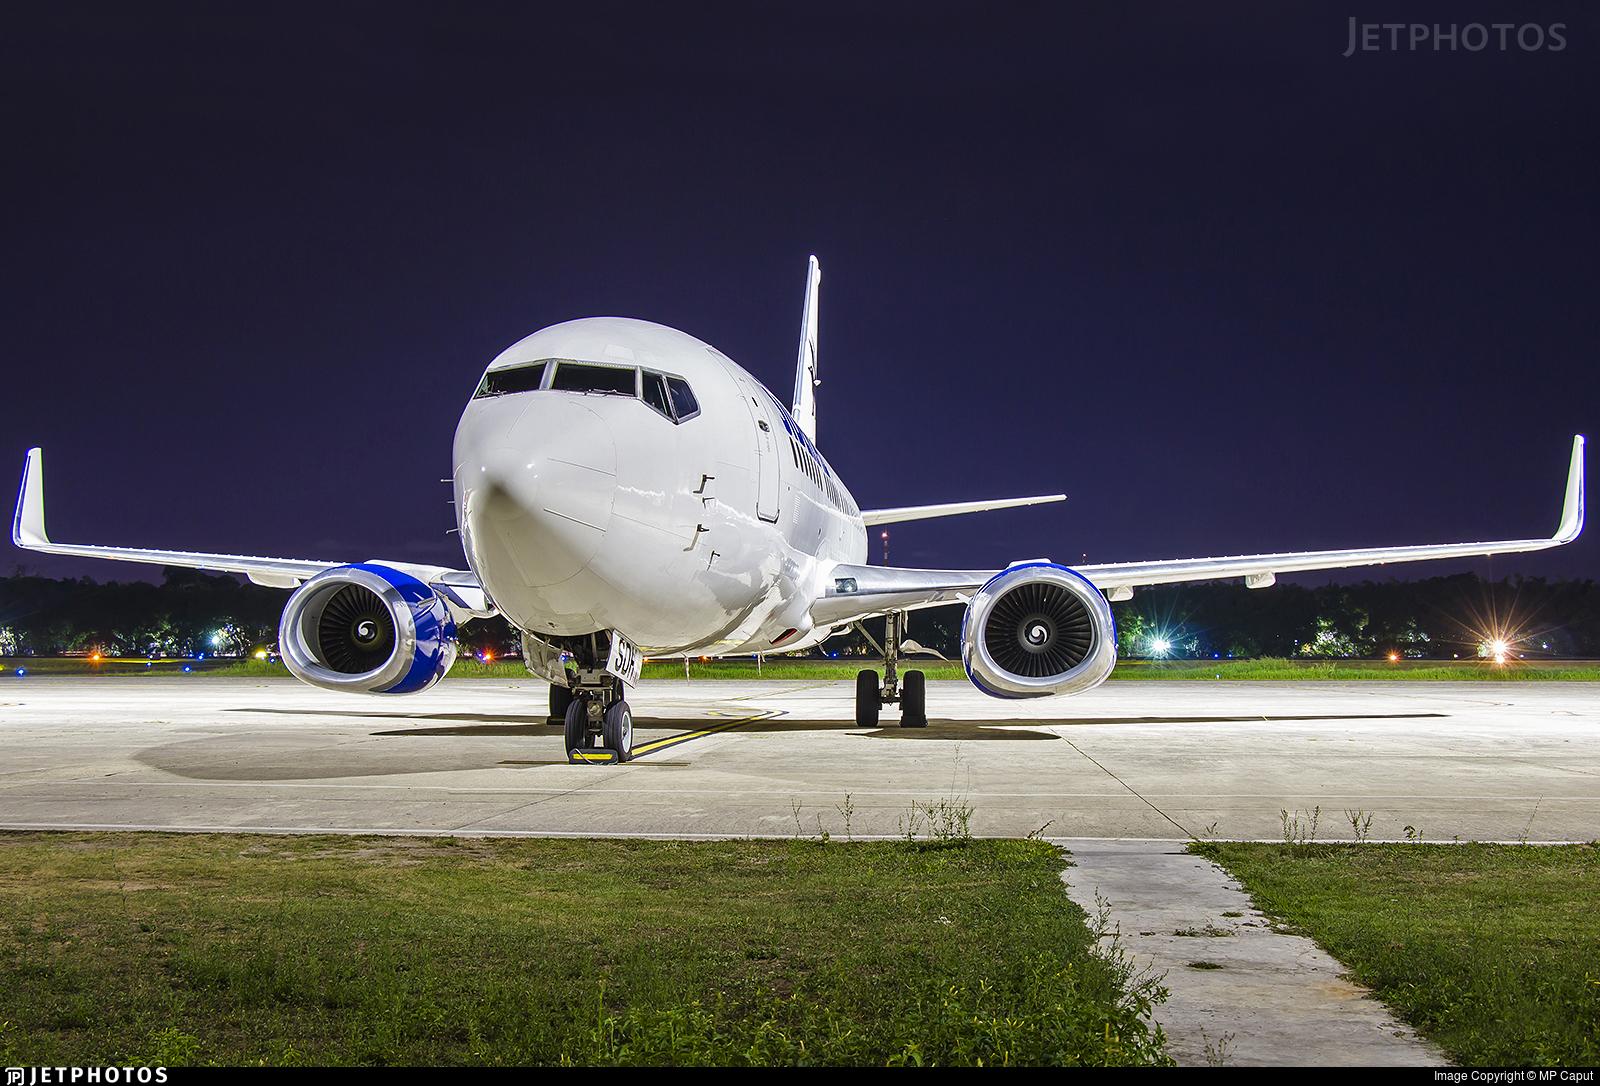 PR-SDH - Boeing 737-55D - Sideral Linhas Aéreas